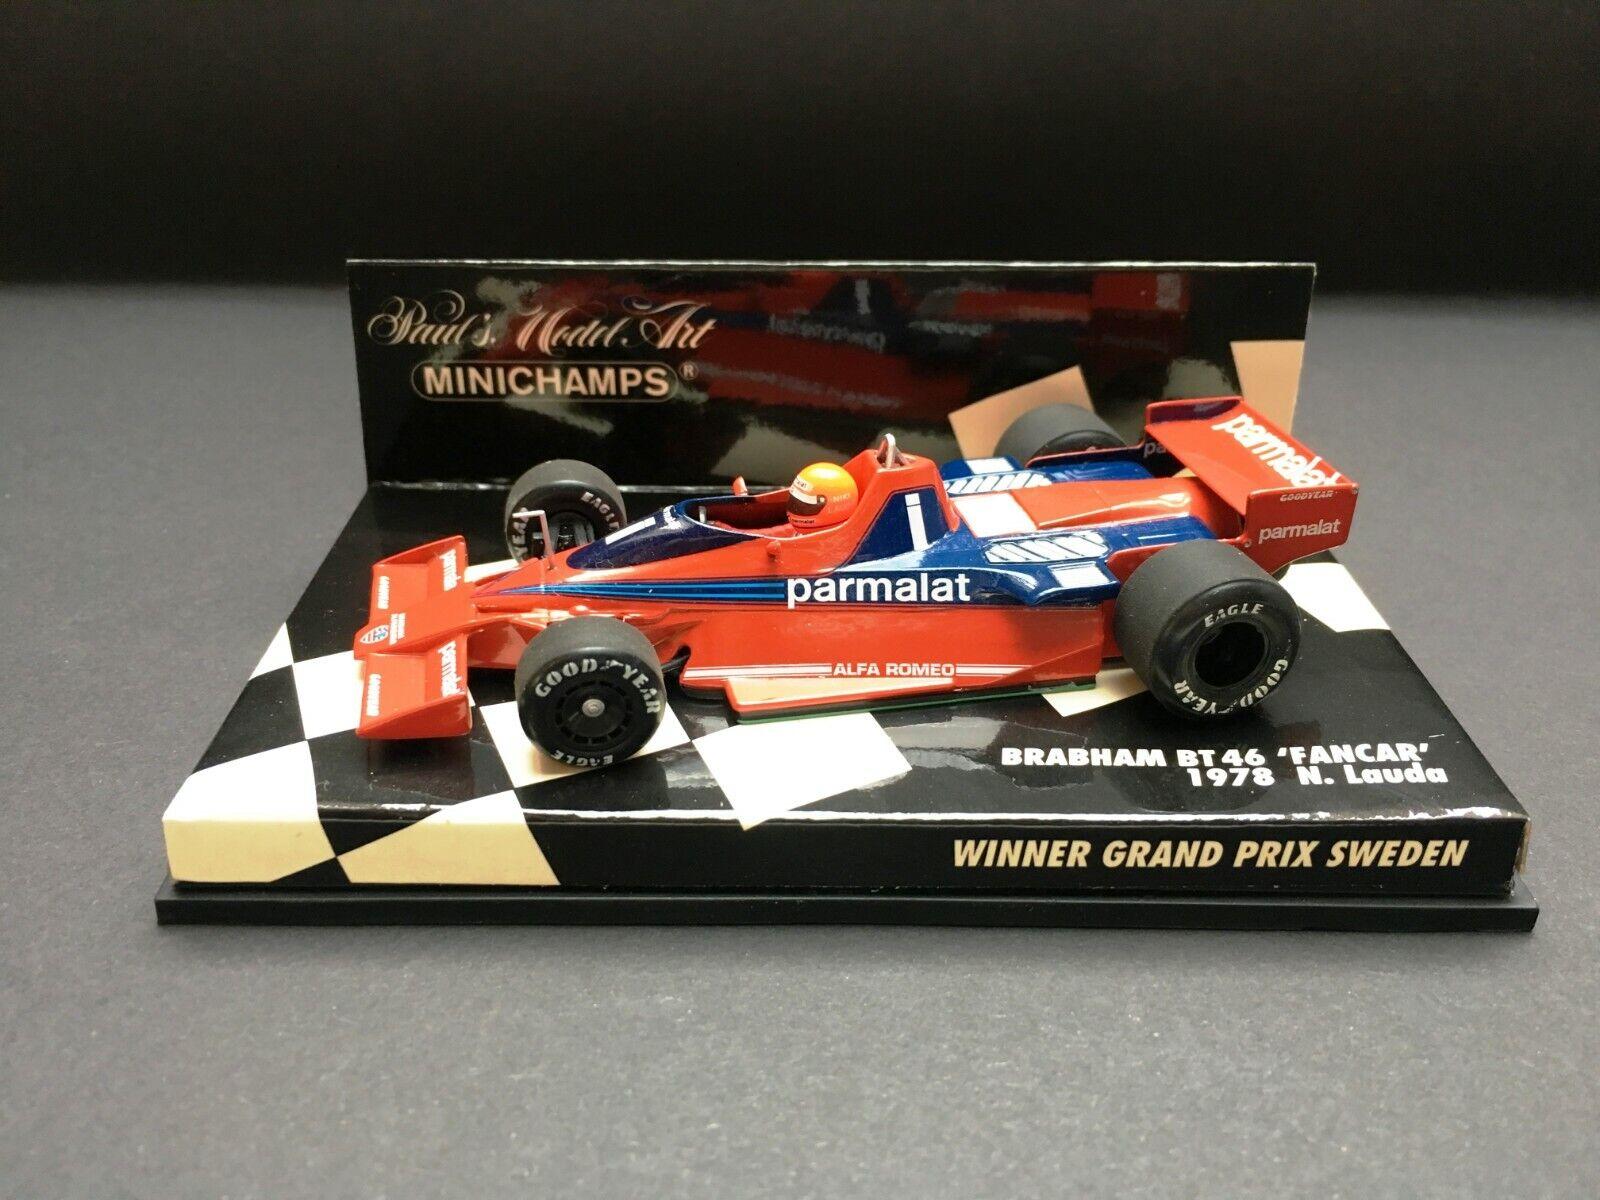 Minichamps - Niki Lauda - Brabham- BT46 fancar - 1978- Winner Swedish GP - 1 43